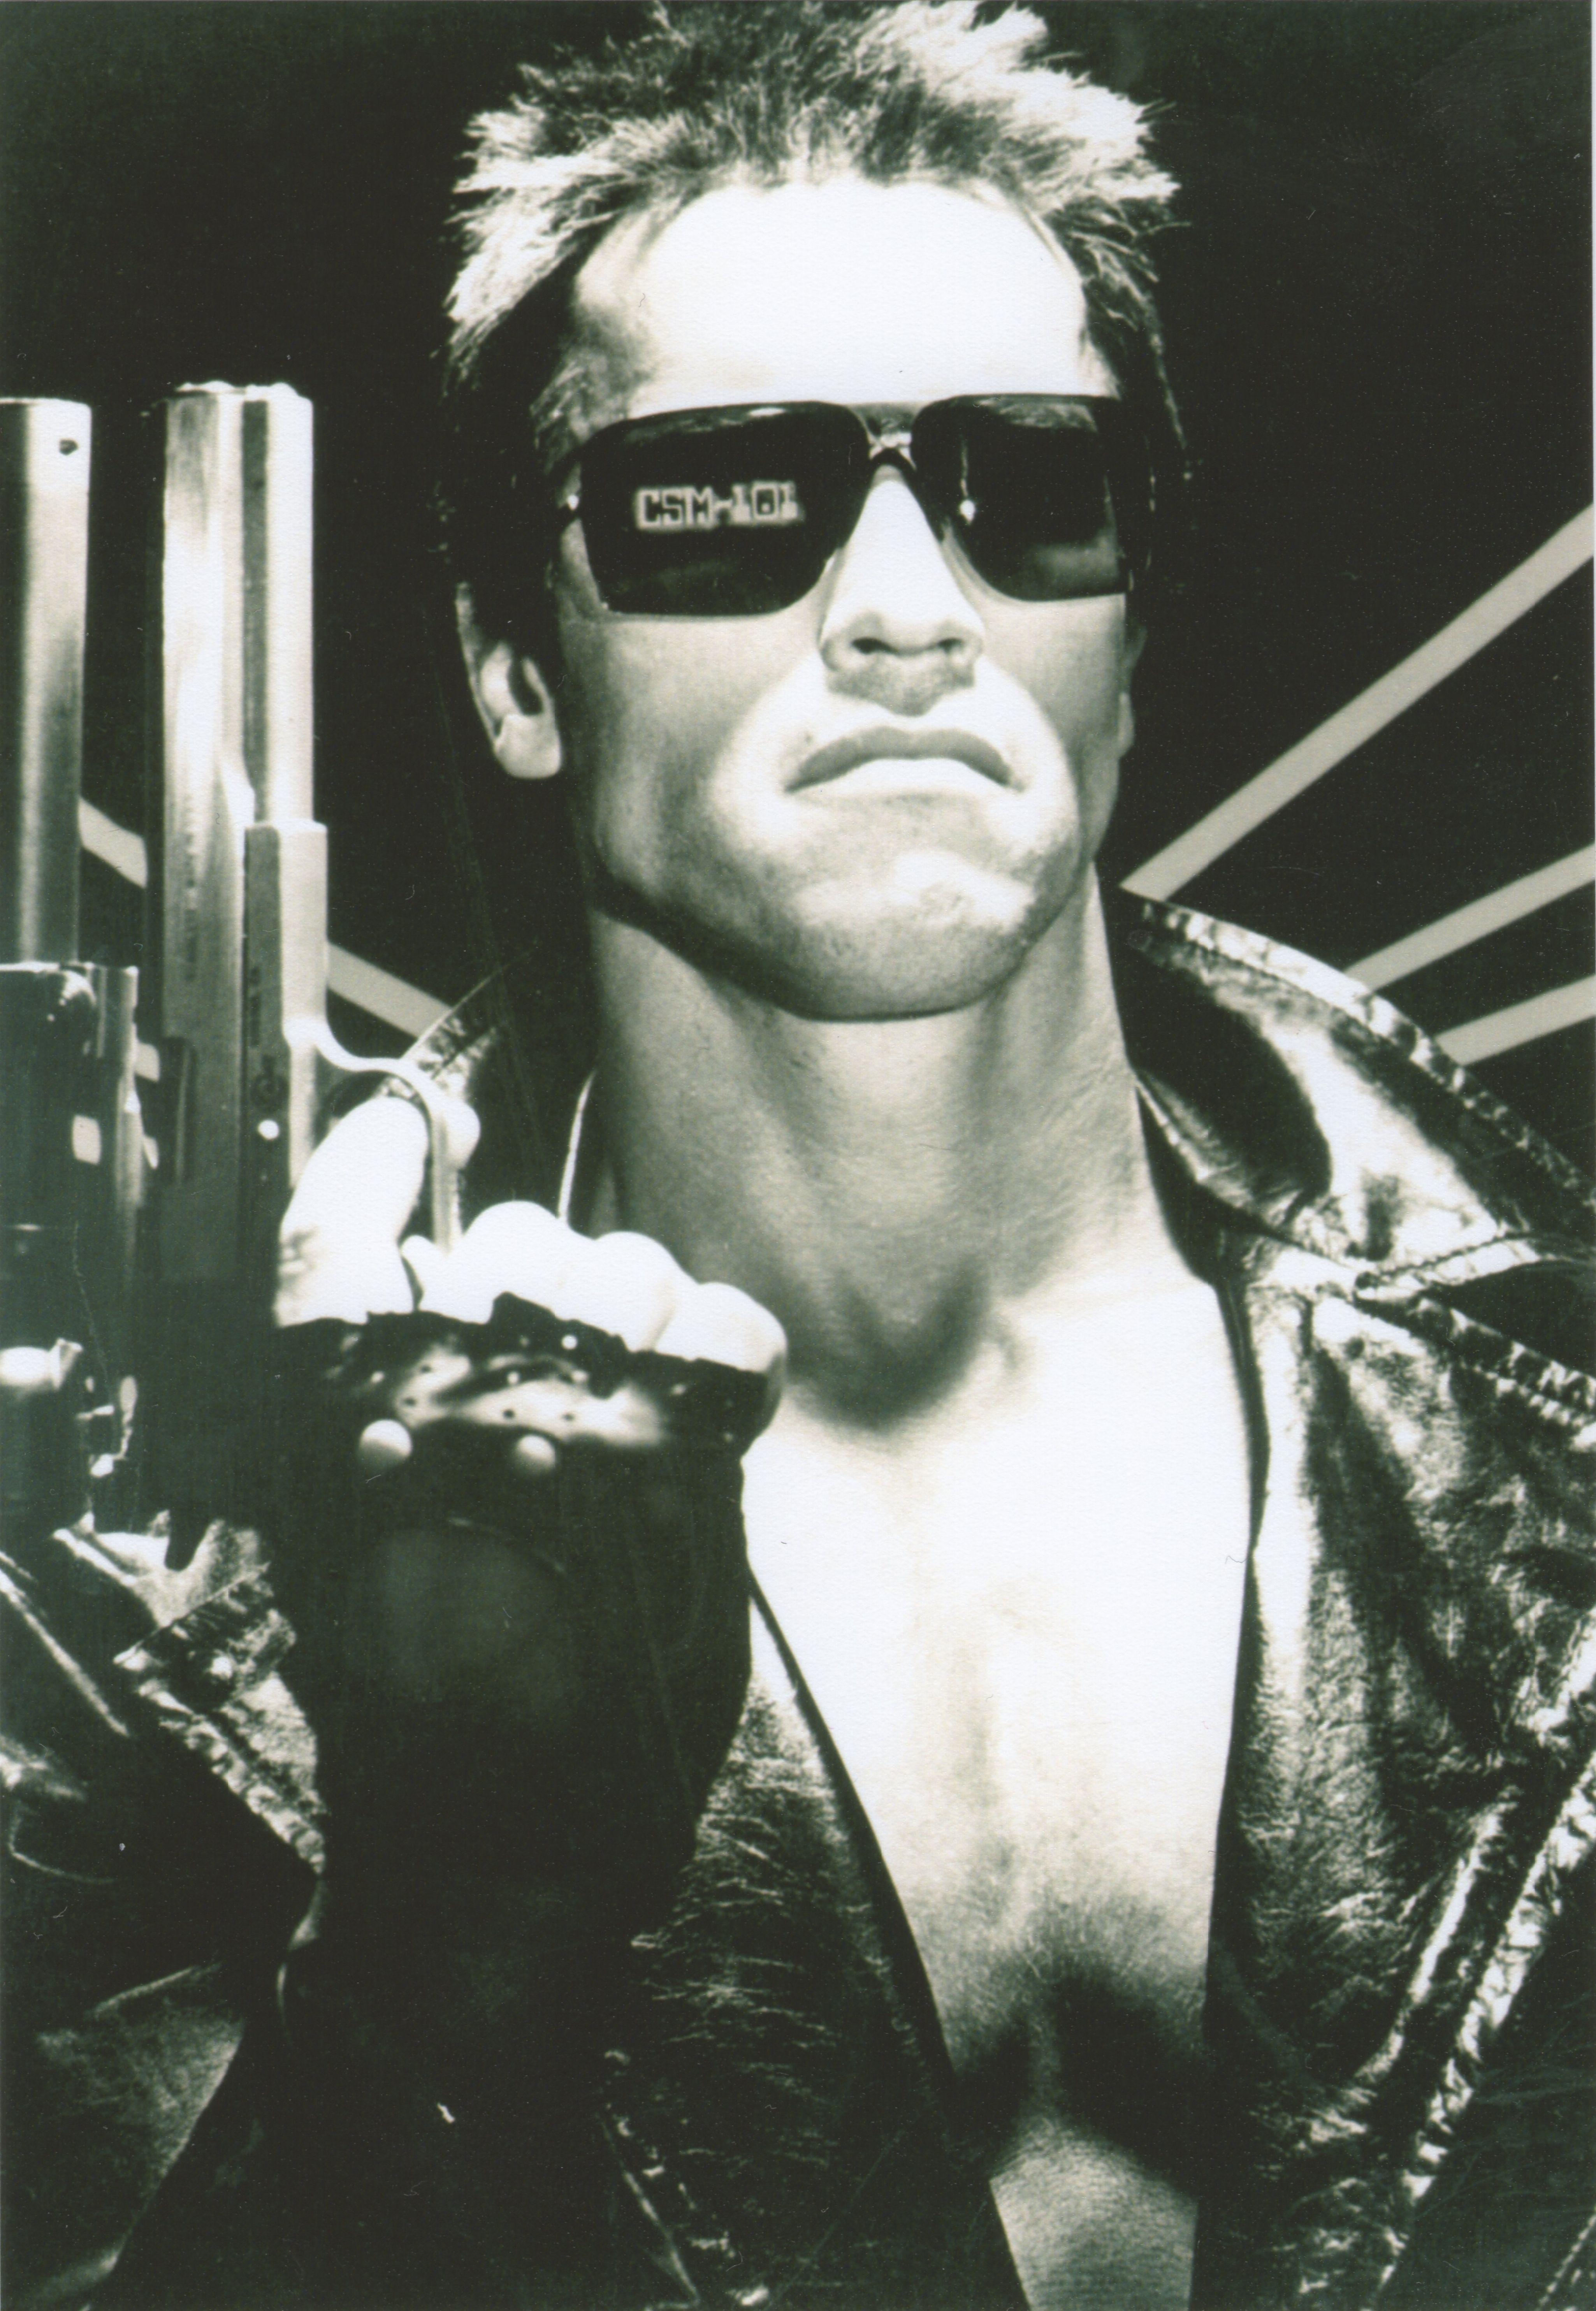 The Terminator (1984) Arnold Schwarzenegger   The Terminator